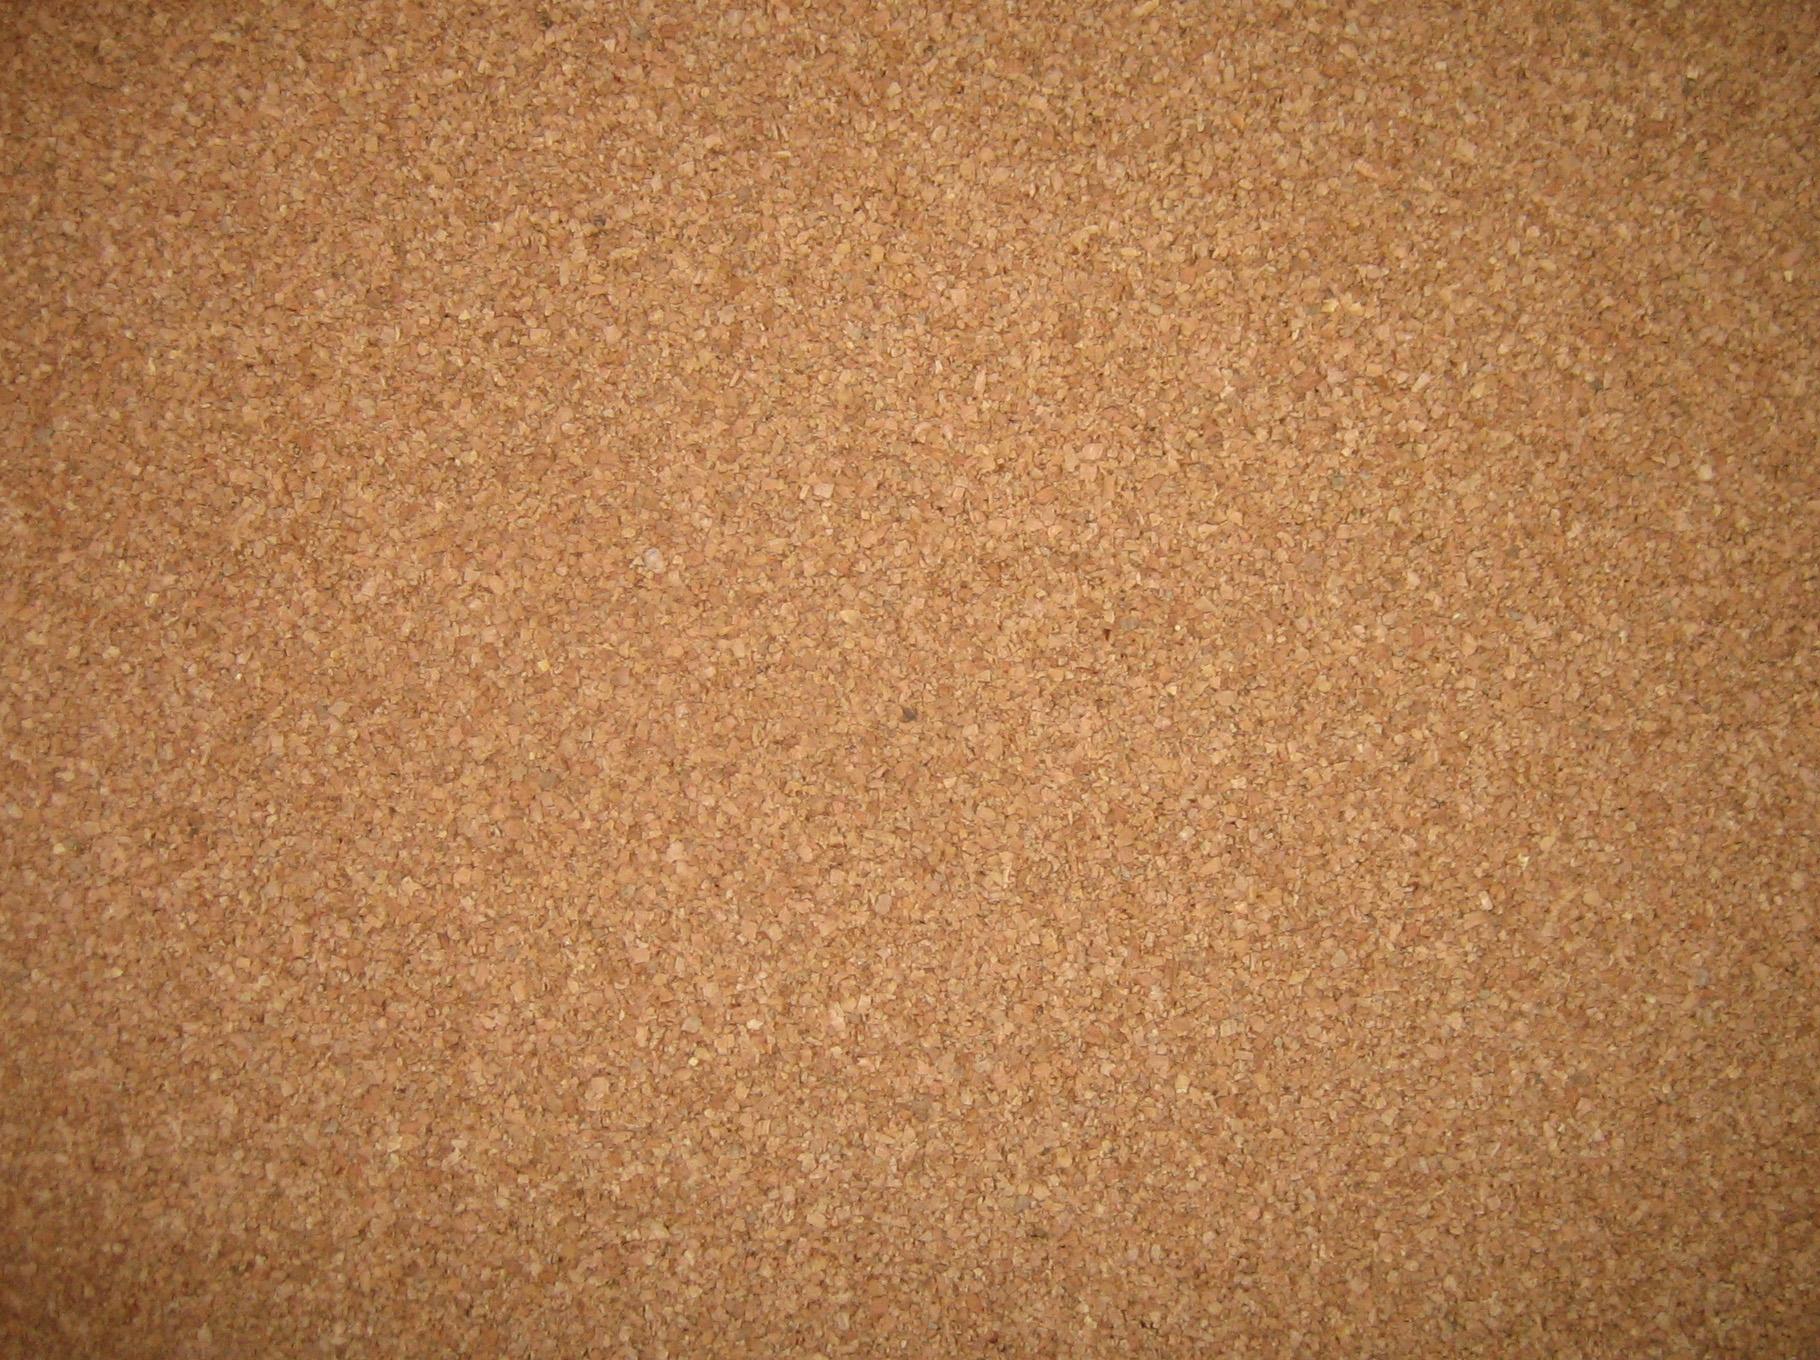 cork texture background stock - photo #30